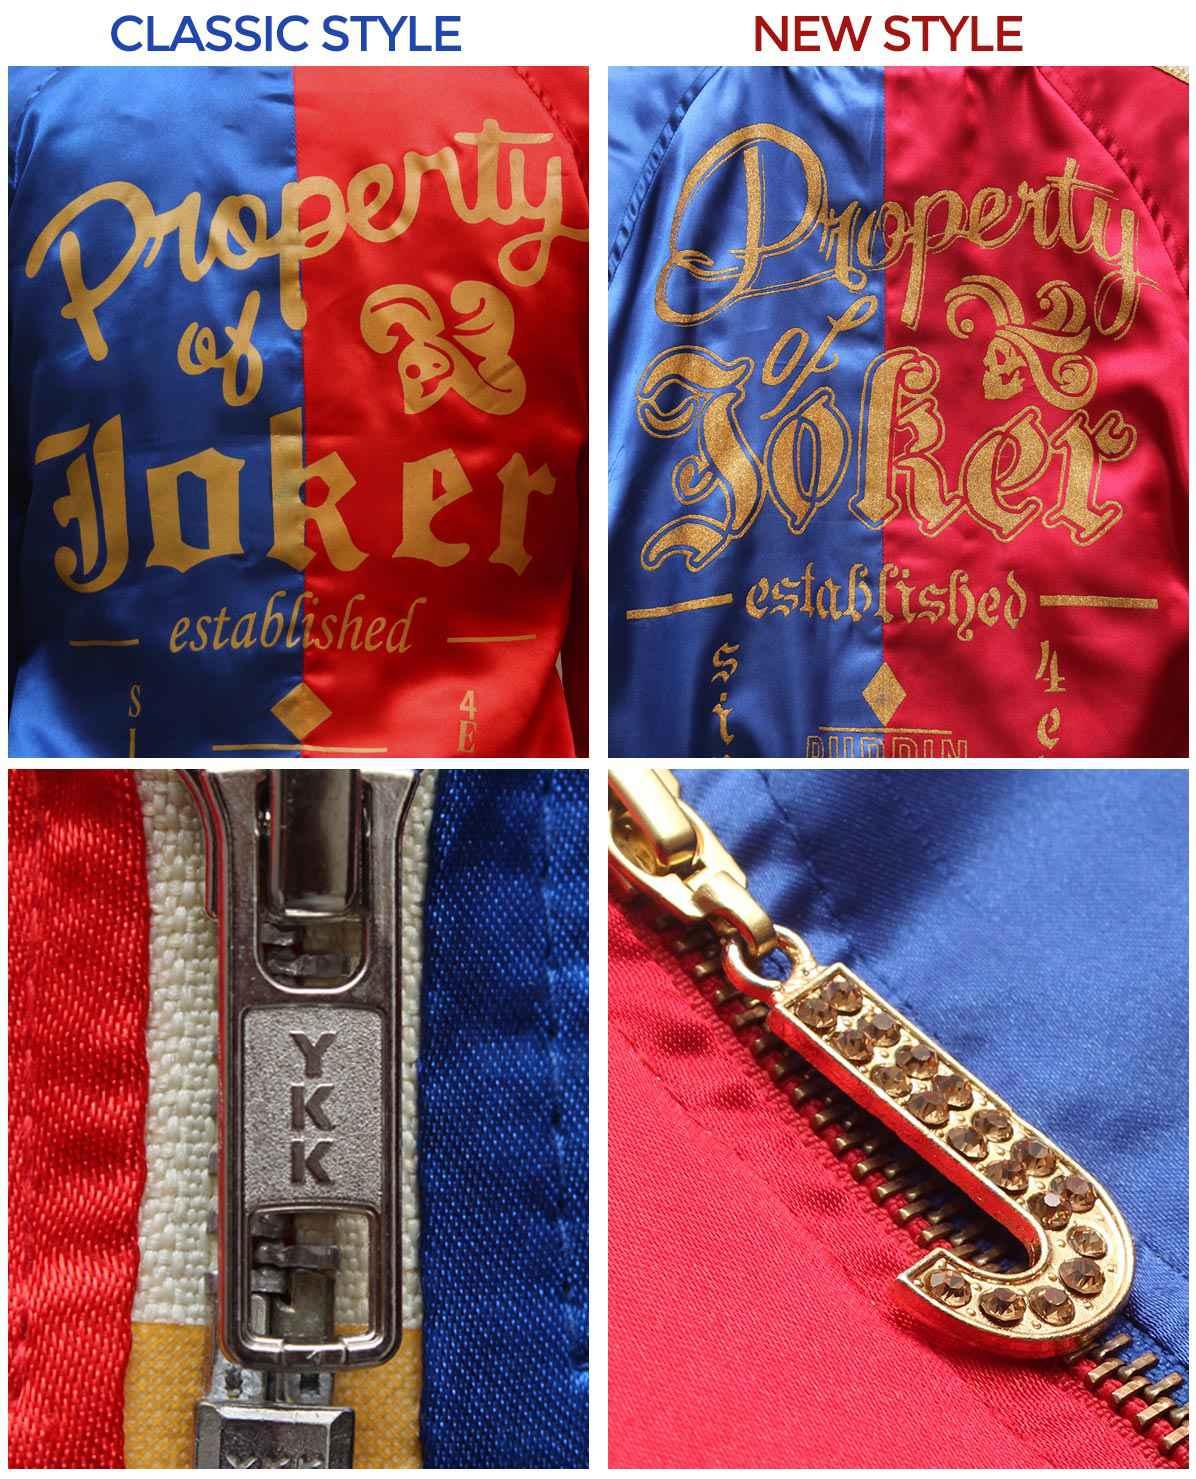 harley quinn jacket comparison